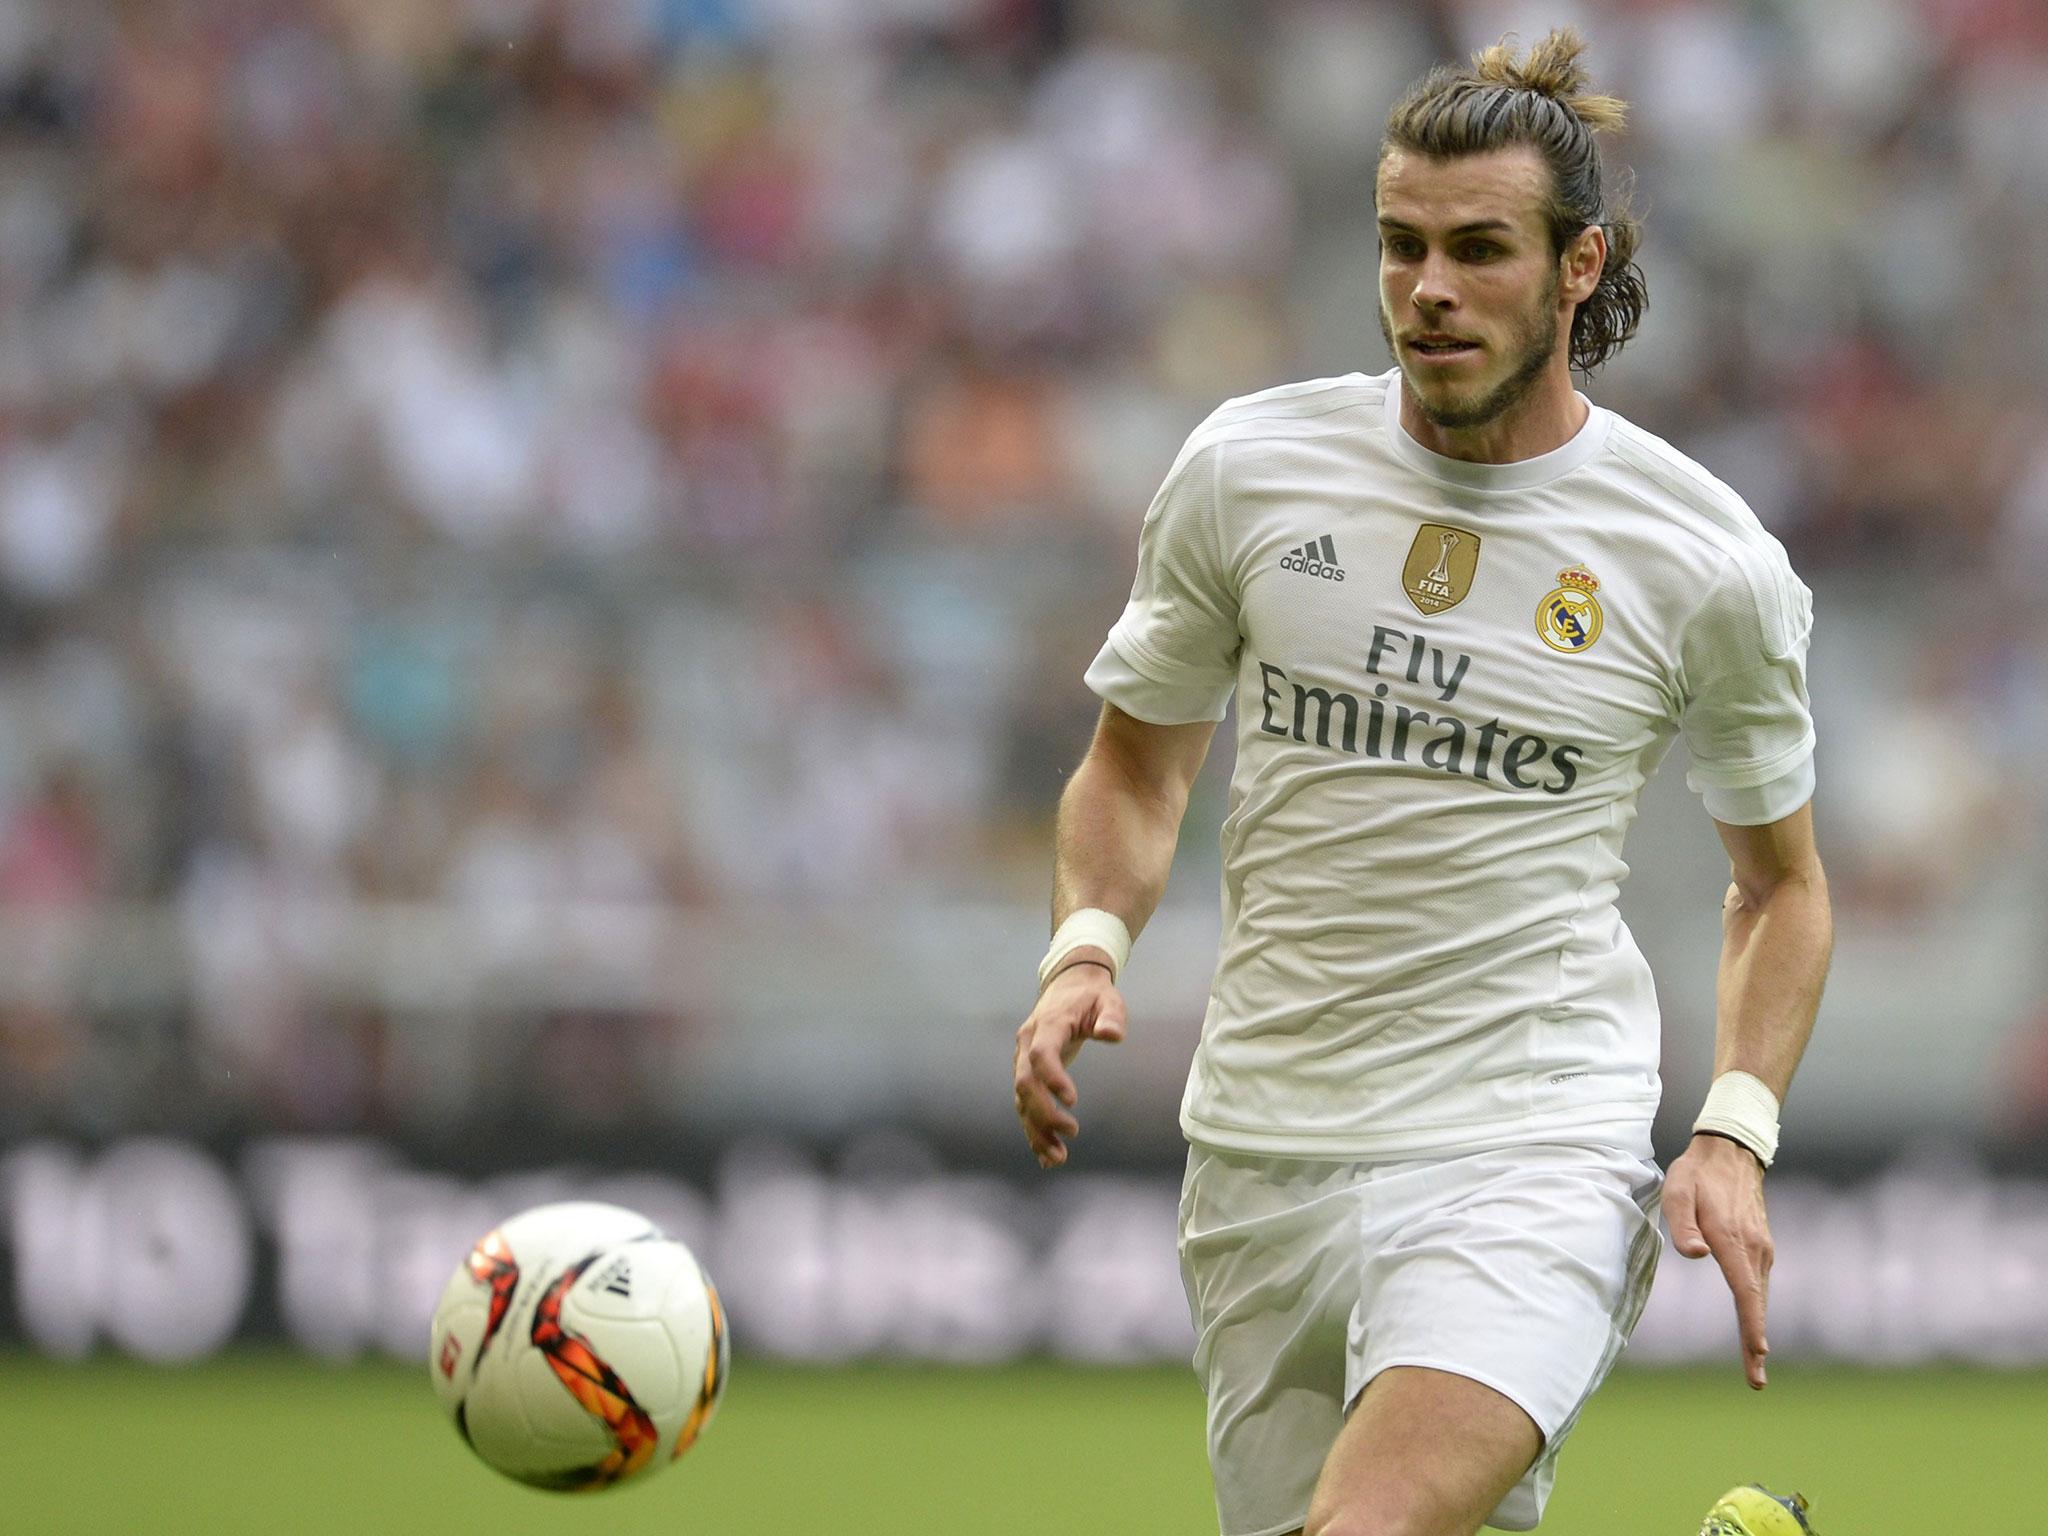 Gareth Bale Computer Backgrounds